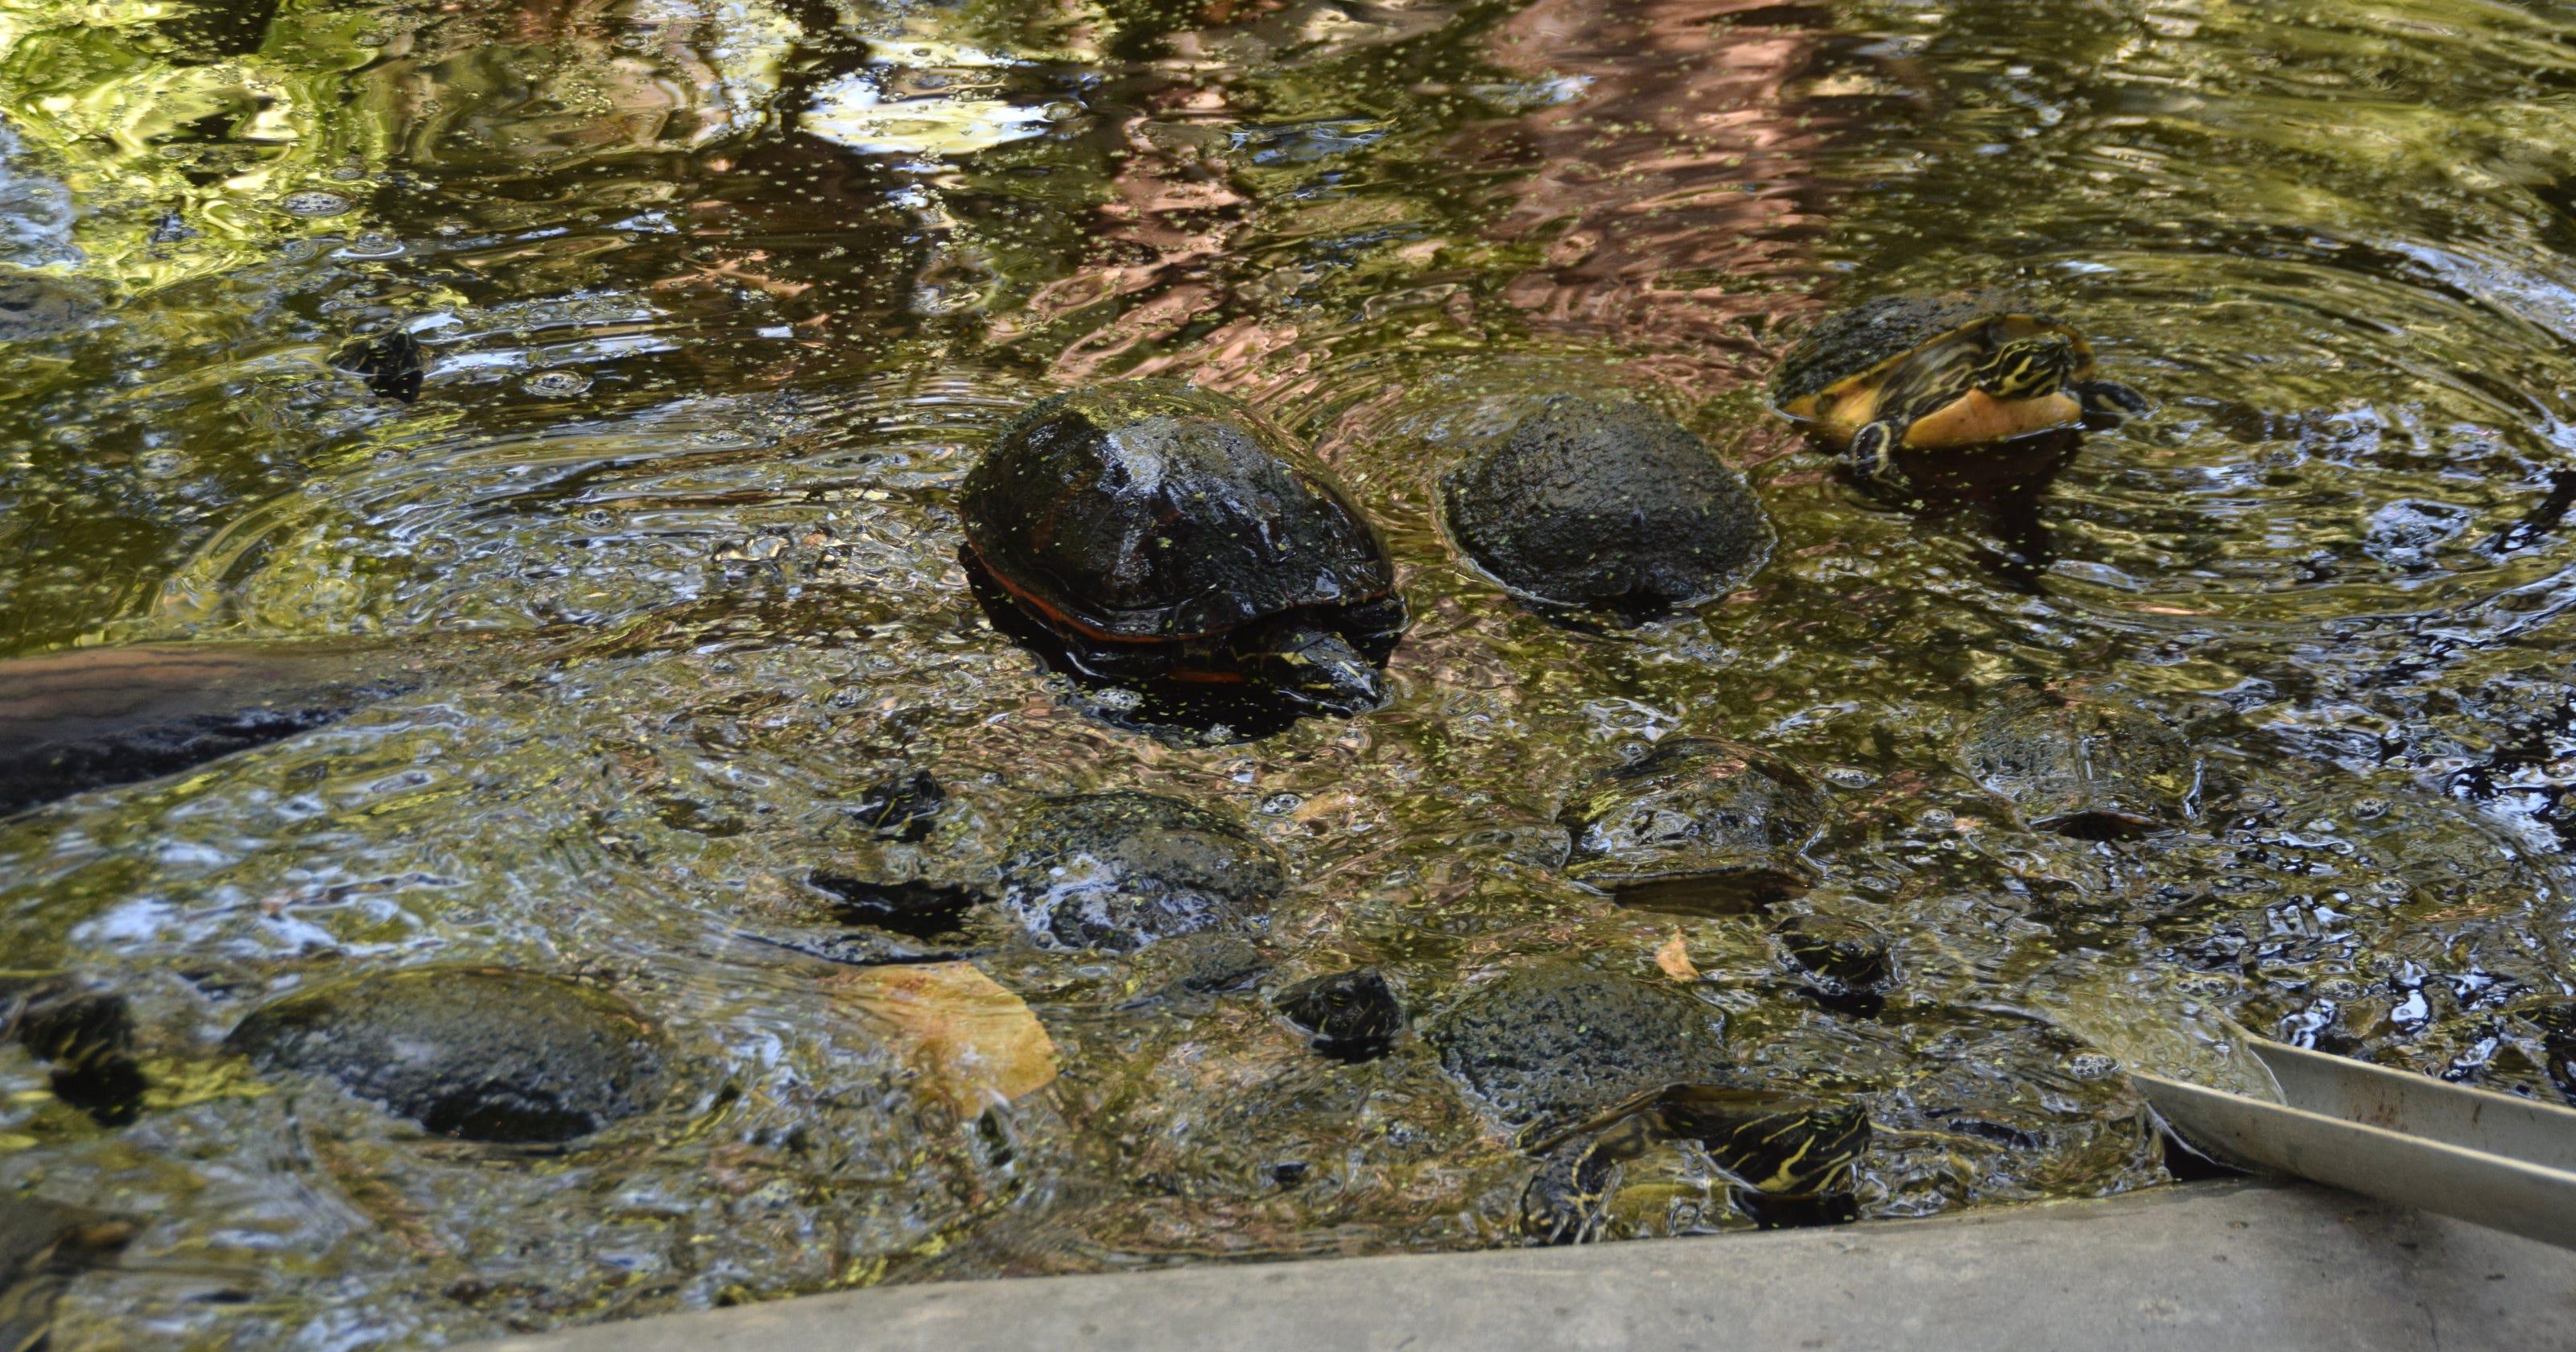 Volunteers come to aid of 20 turtles at Wonder Gardens